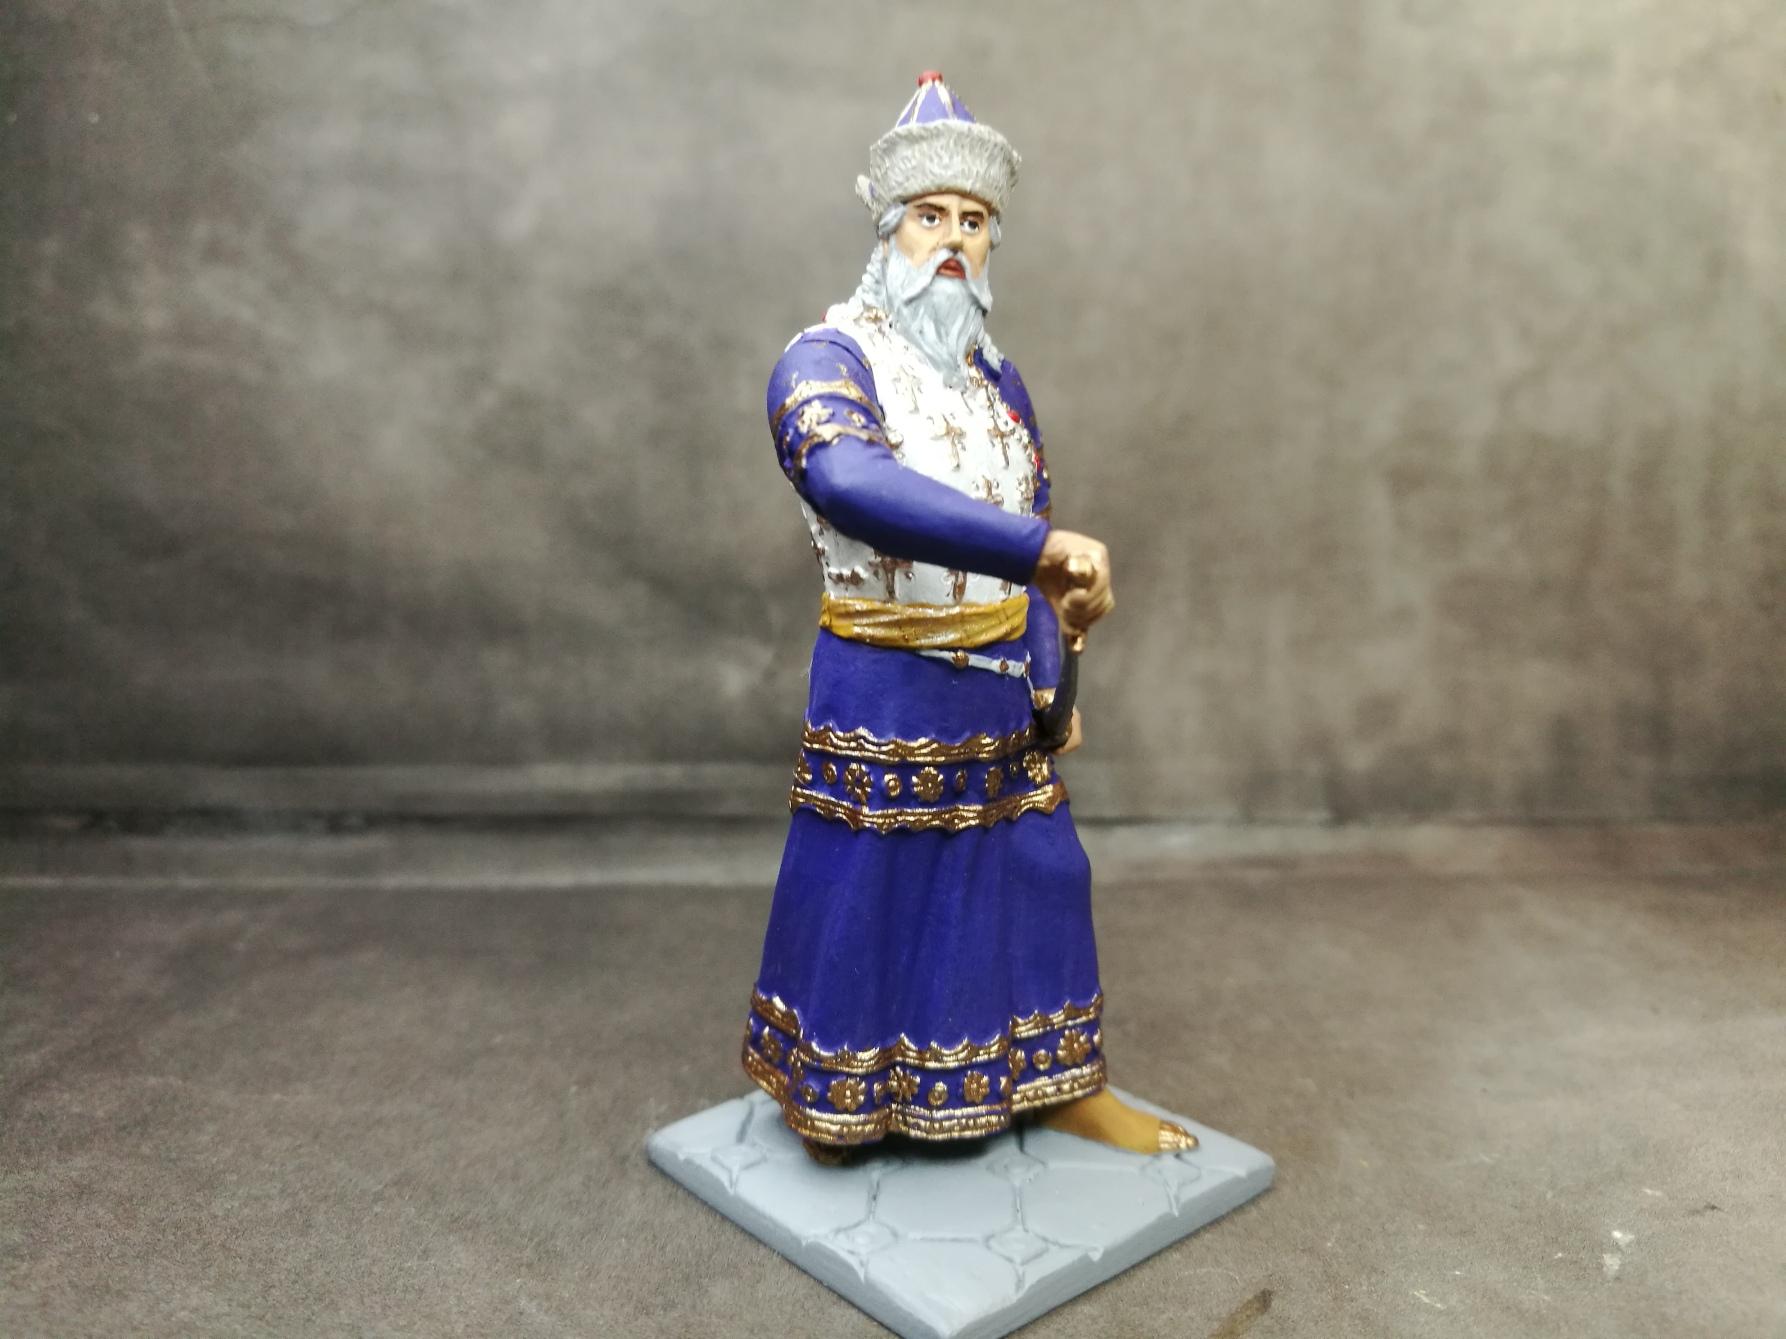 Byzantine emperor, Manuel II Palaiologos , Μανουηλ Παλαιολογος